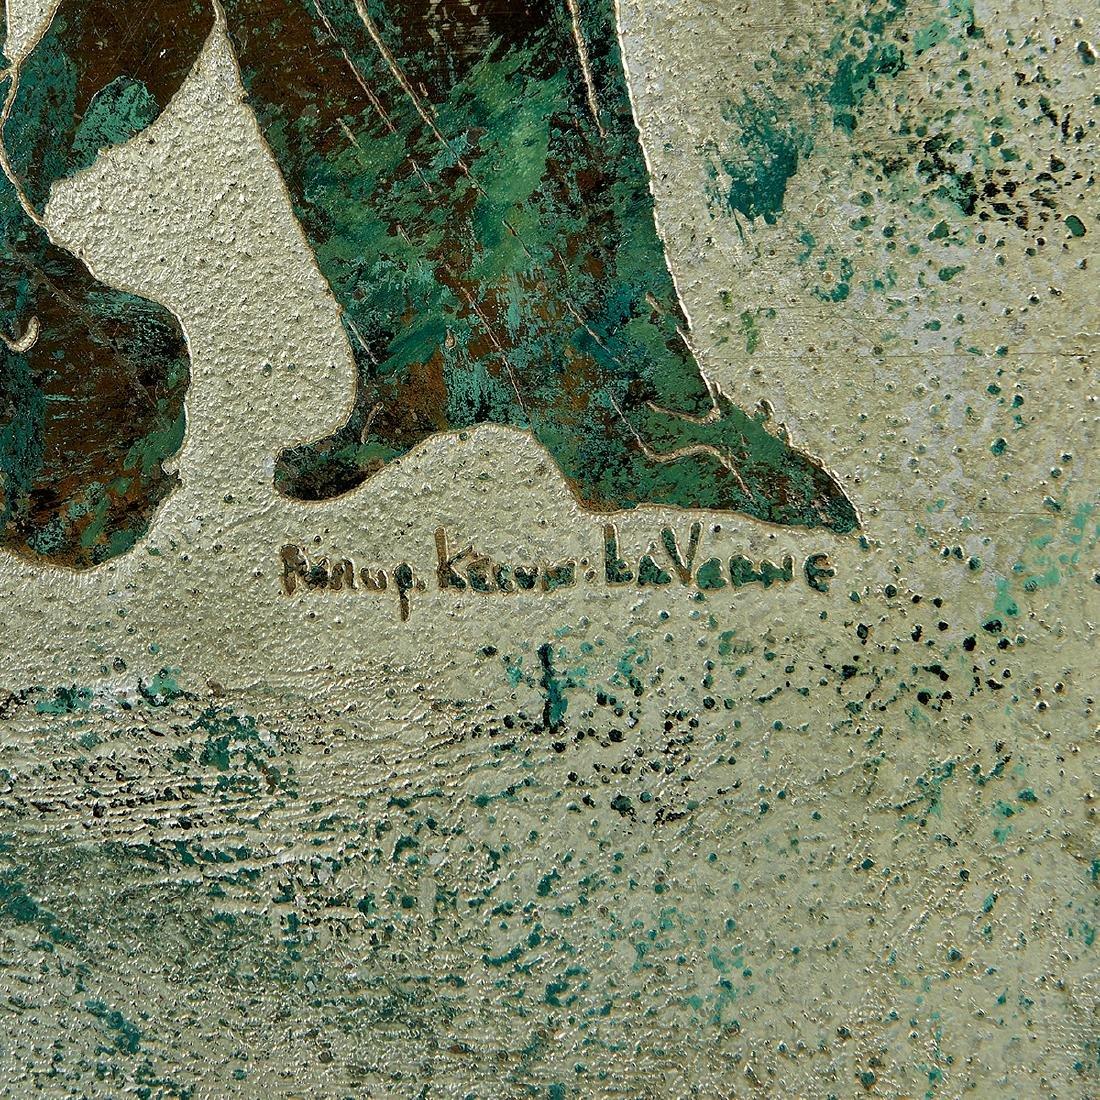 Philip LaVerne & Kelvin LaVerne coffee table - 5